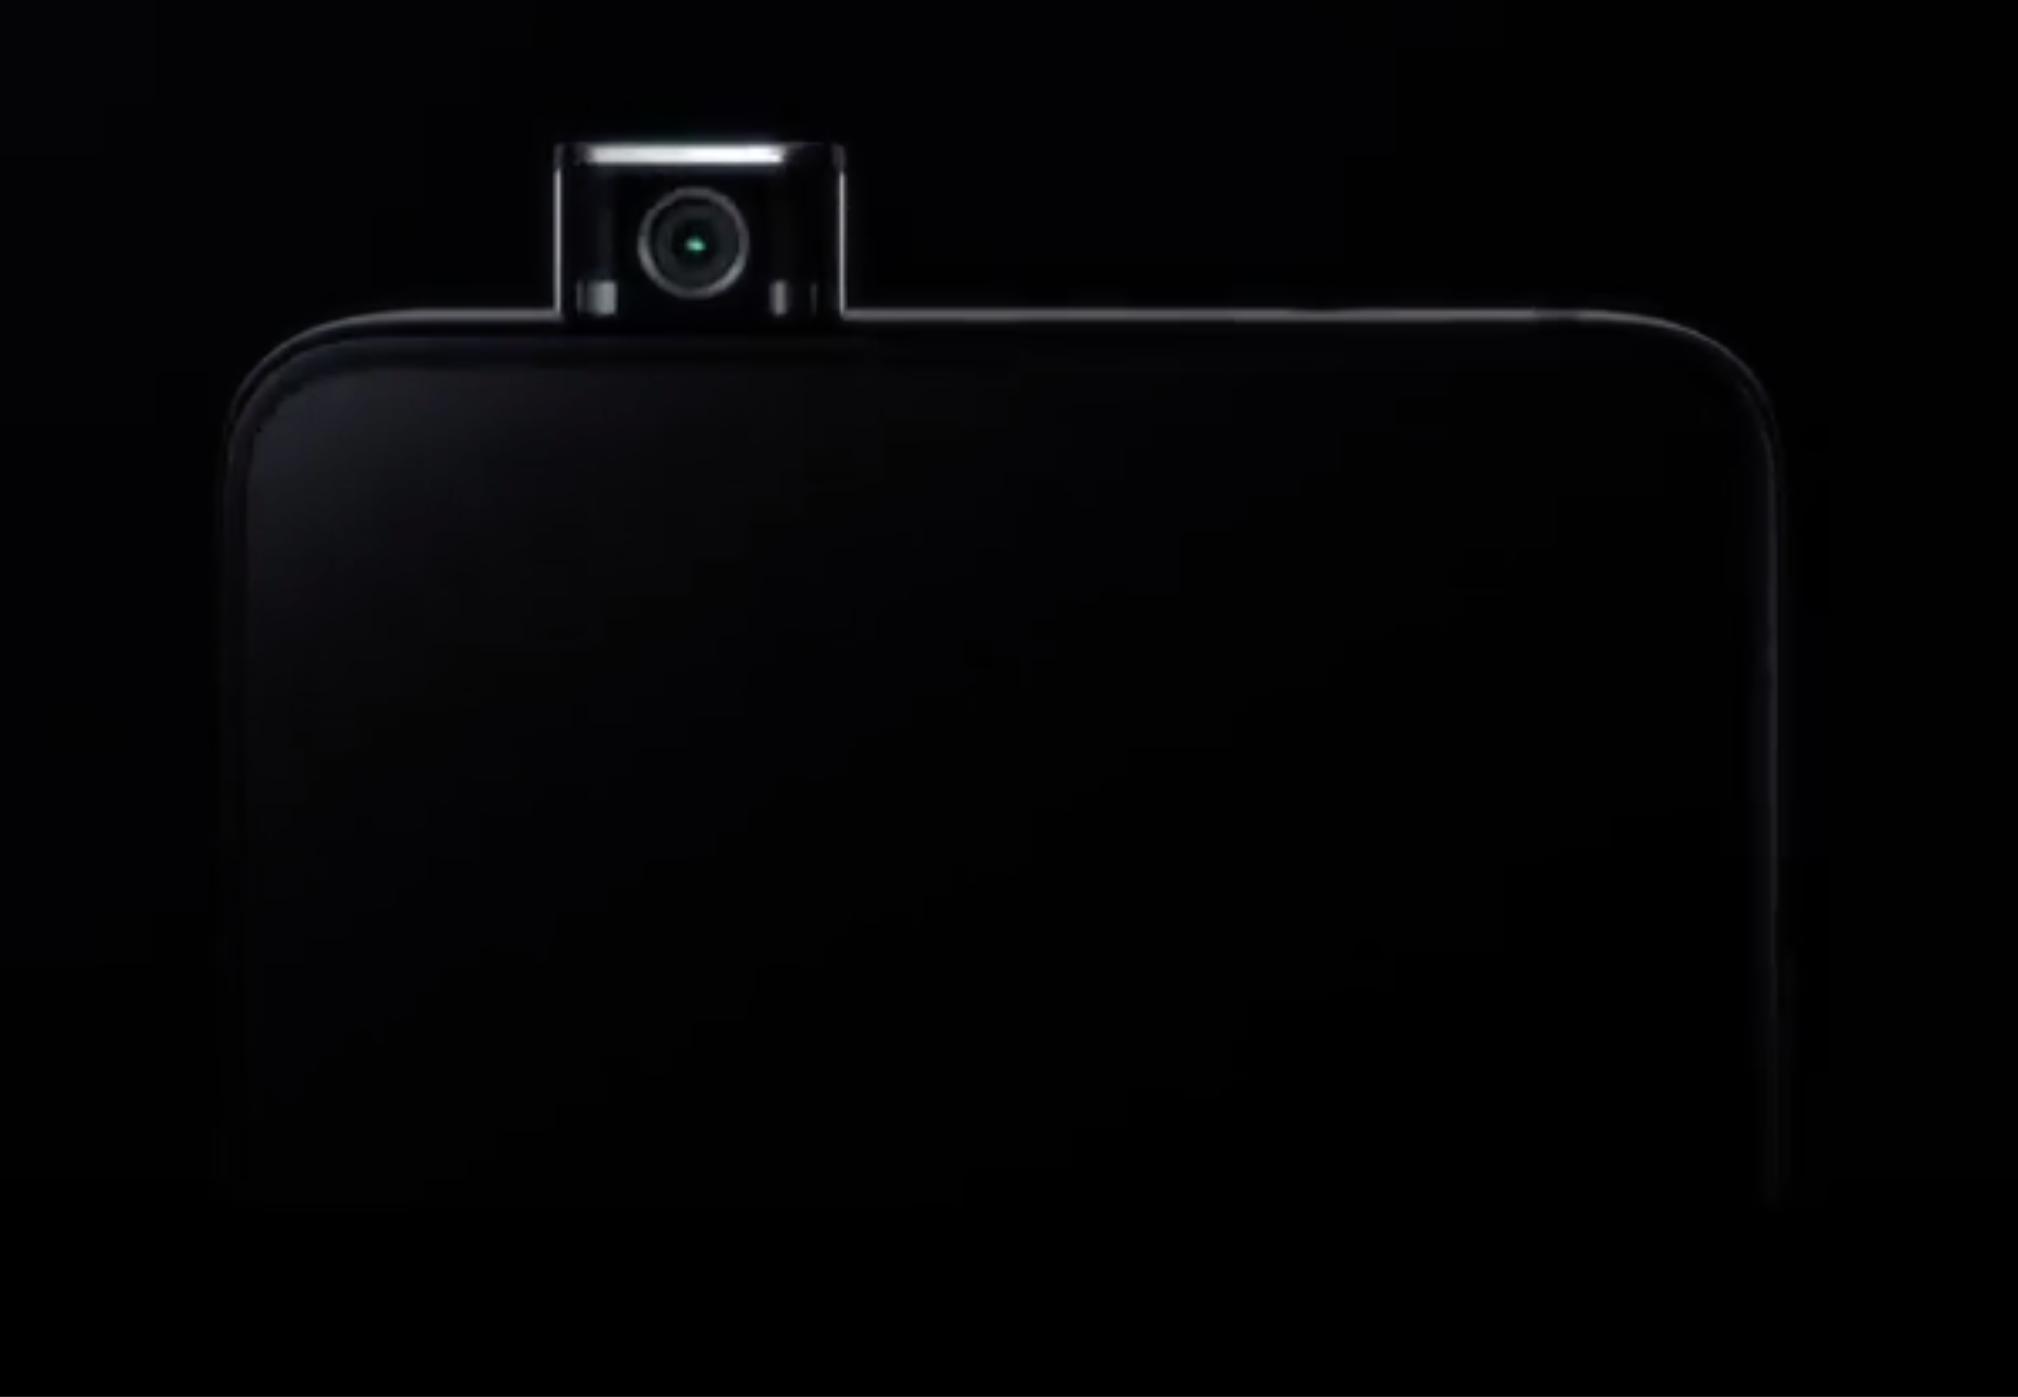 Confirmado oficialmente, Redmi lanzará un dispositivo con cámara emergente